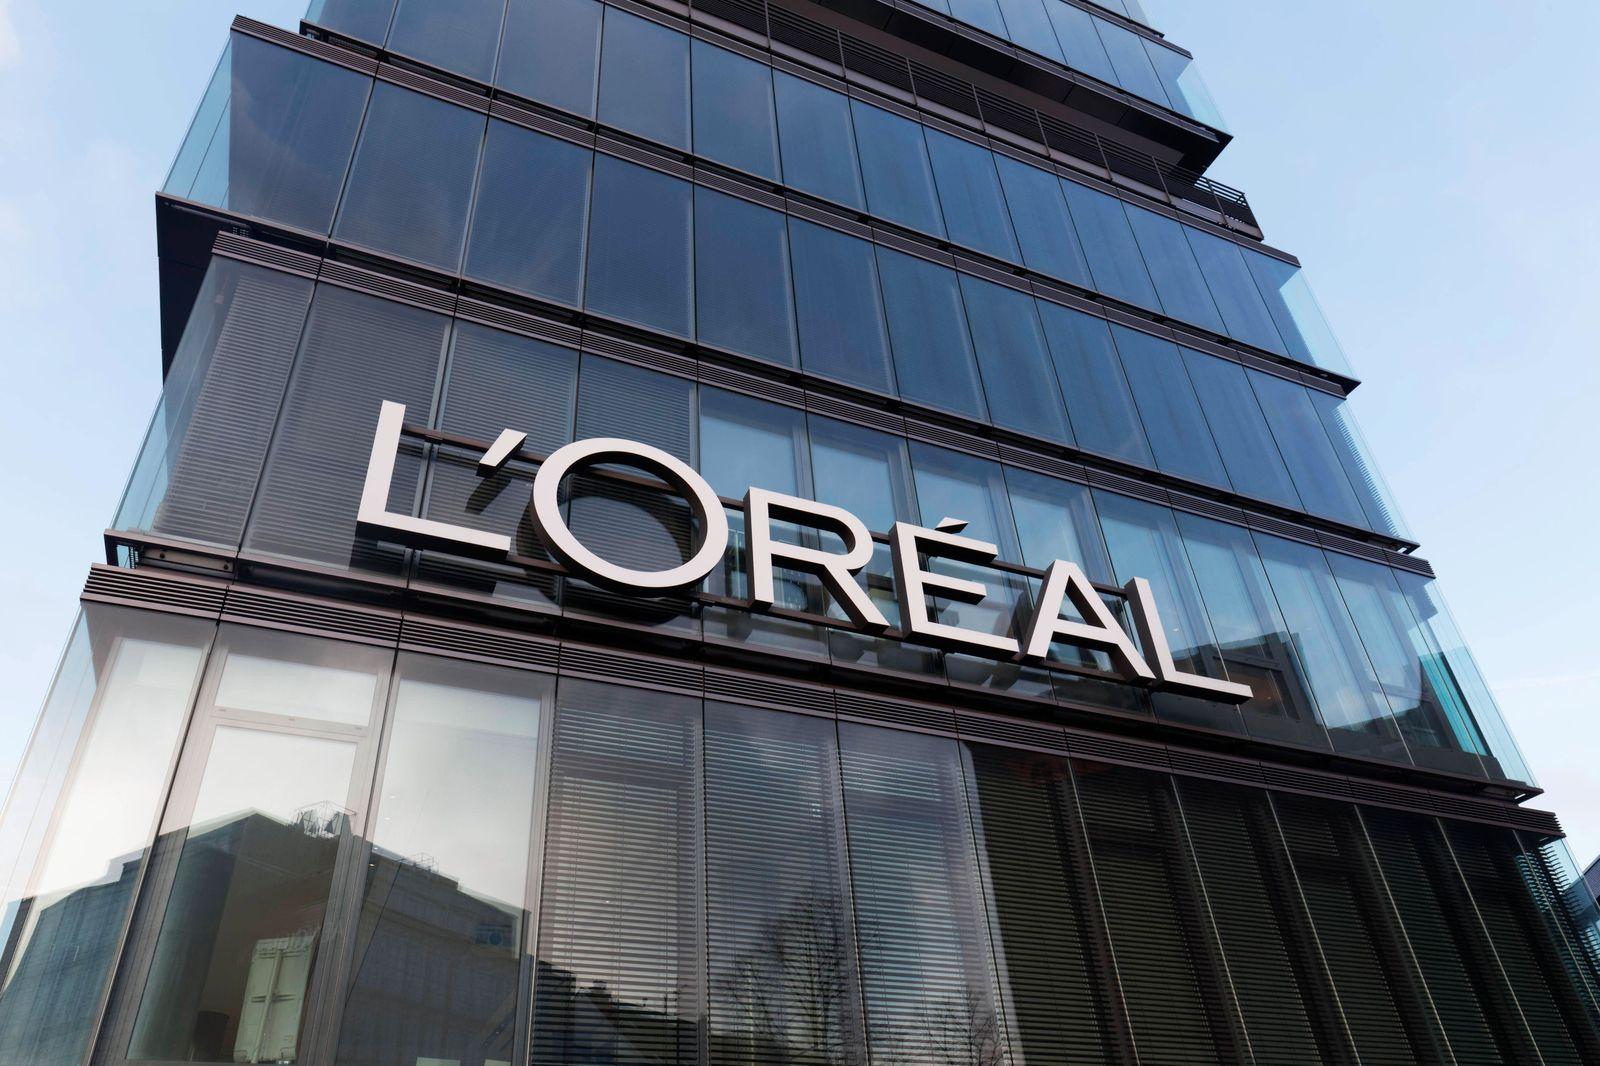 L Oréal, Deutschlandsitz, Düsseldorf, Nordrhein-Westfalen, Deutschland, Europa *** L Oréal, Germany headquarters, Düssel